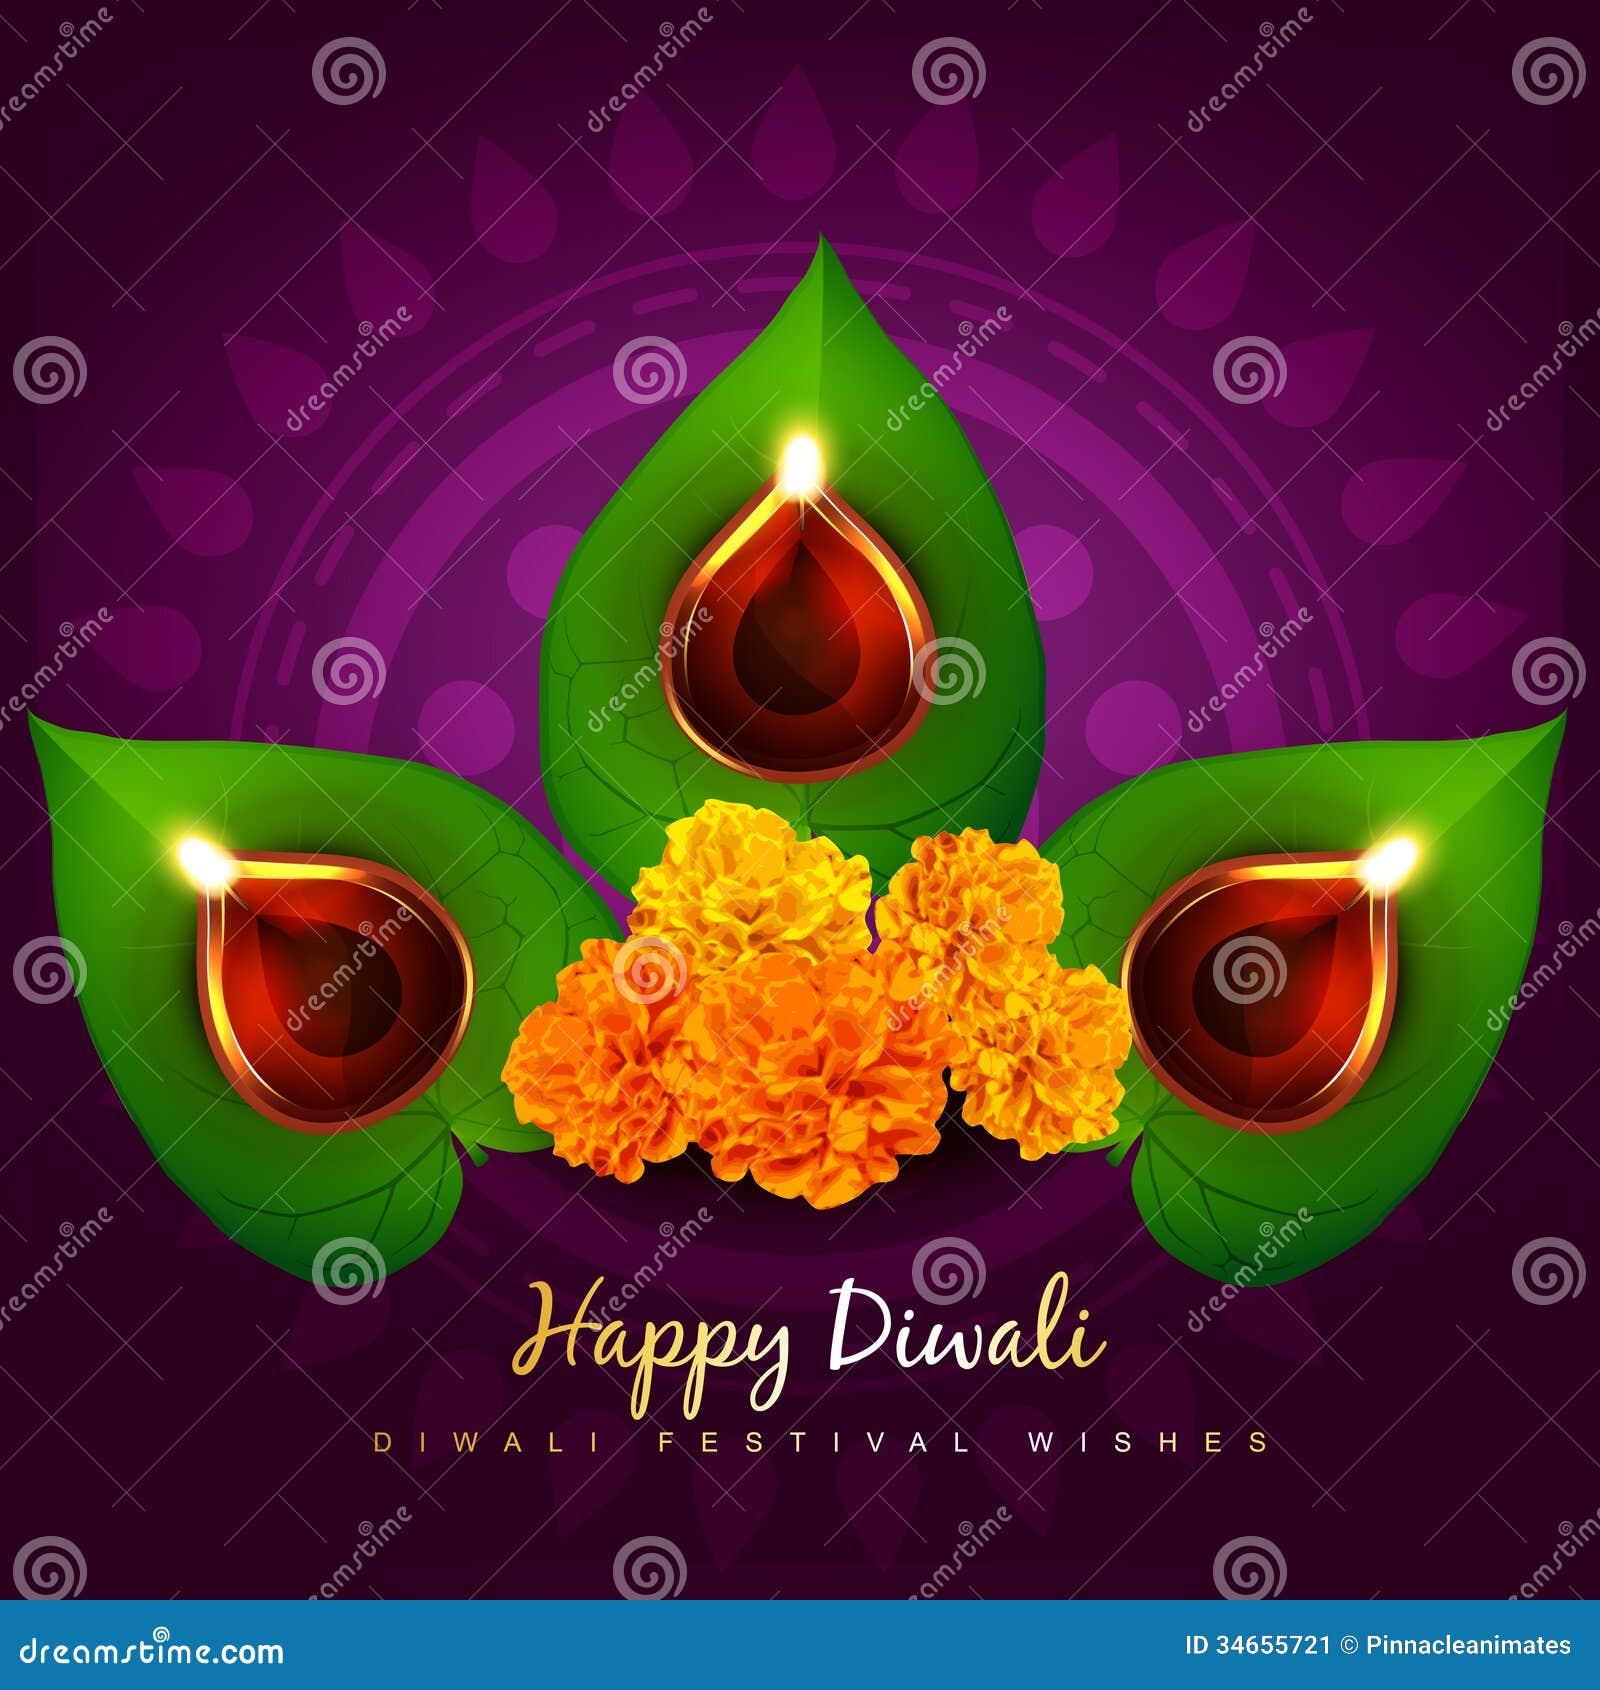 Vector diwali diya stock vector. Illustration of element - 34655721 for diwali diya wallpaper vector  45hul